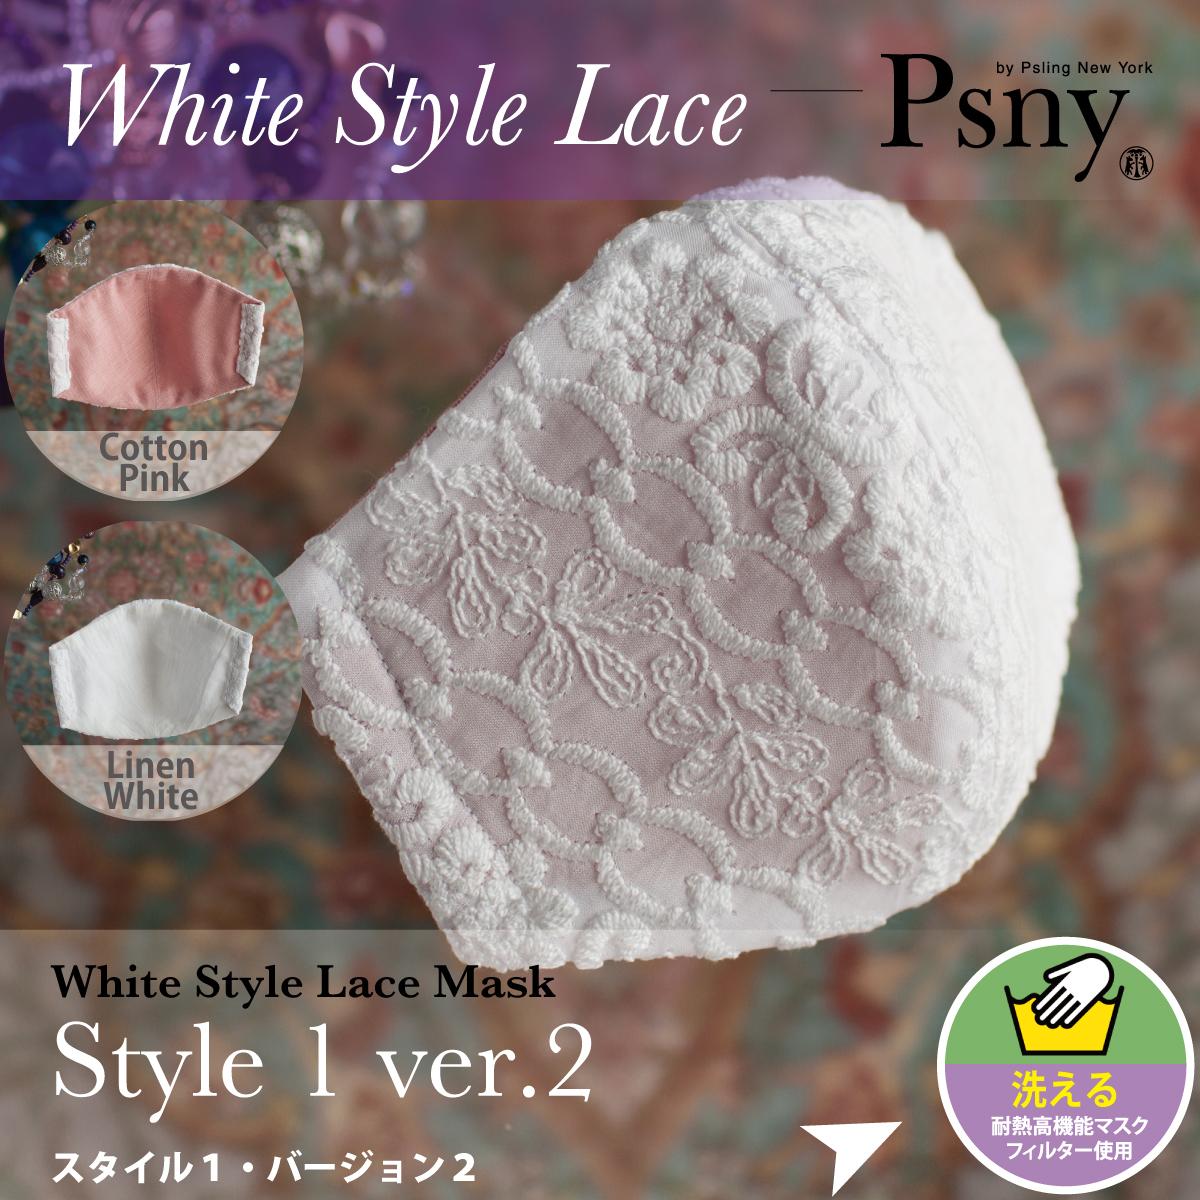 PSNY レース ホワイト・スタイル1(v2 花粉 黄砂 洗える不織布フィルター入り 立体 大人用 マスク 送料無料 L01